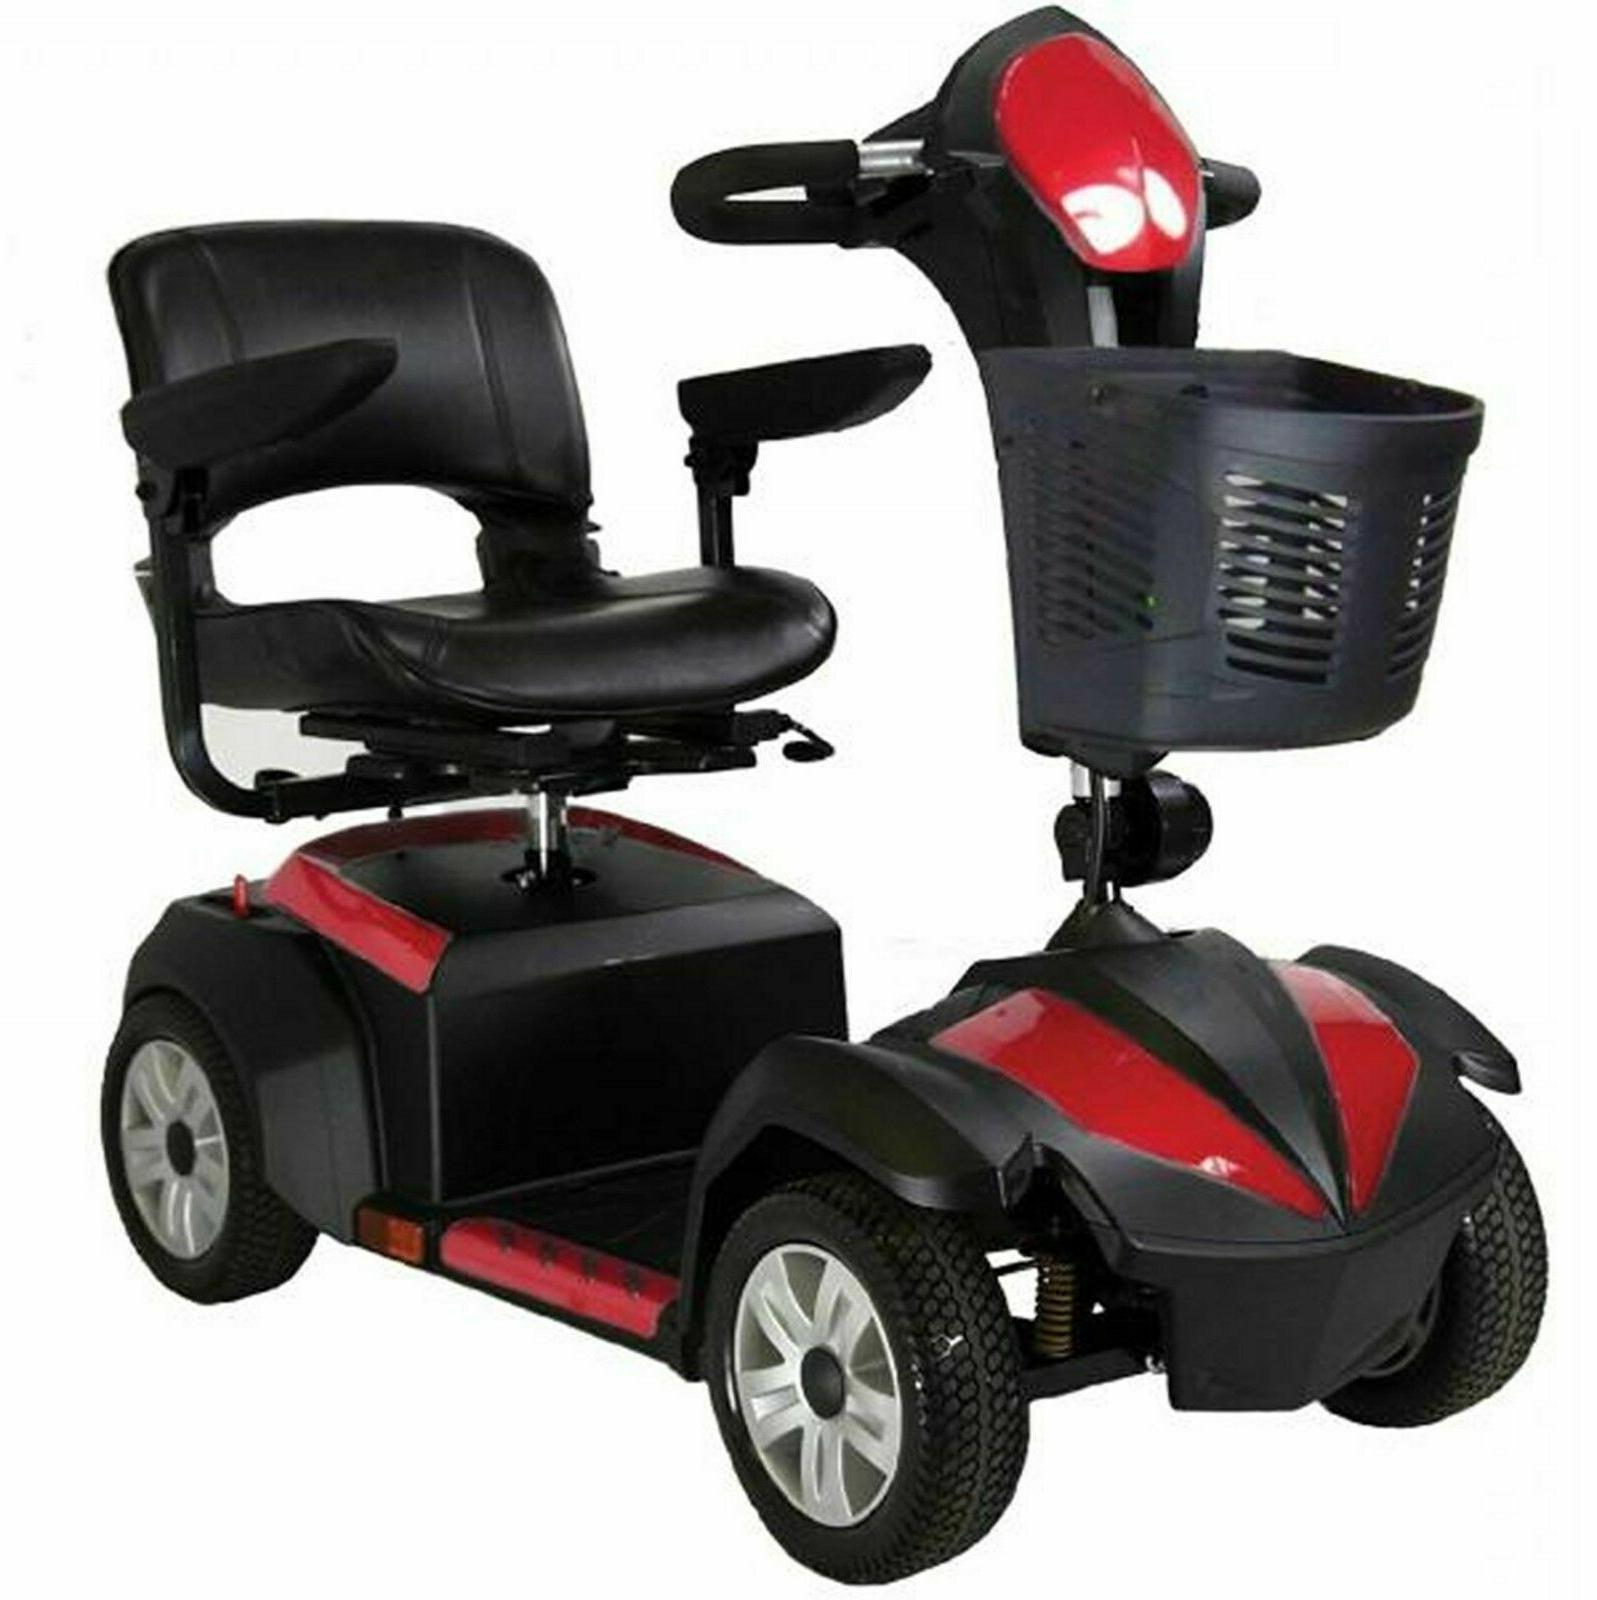 new ventura418fs ventura power mobility scooter 4